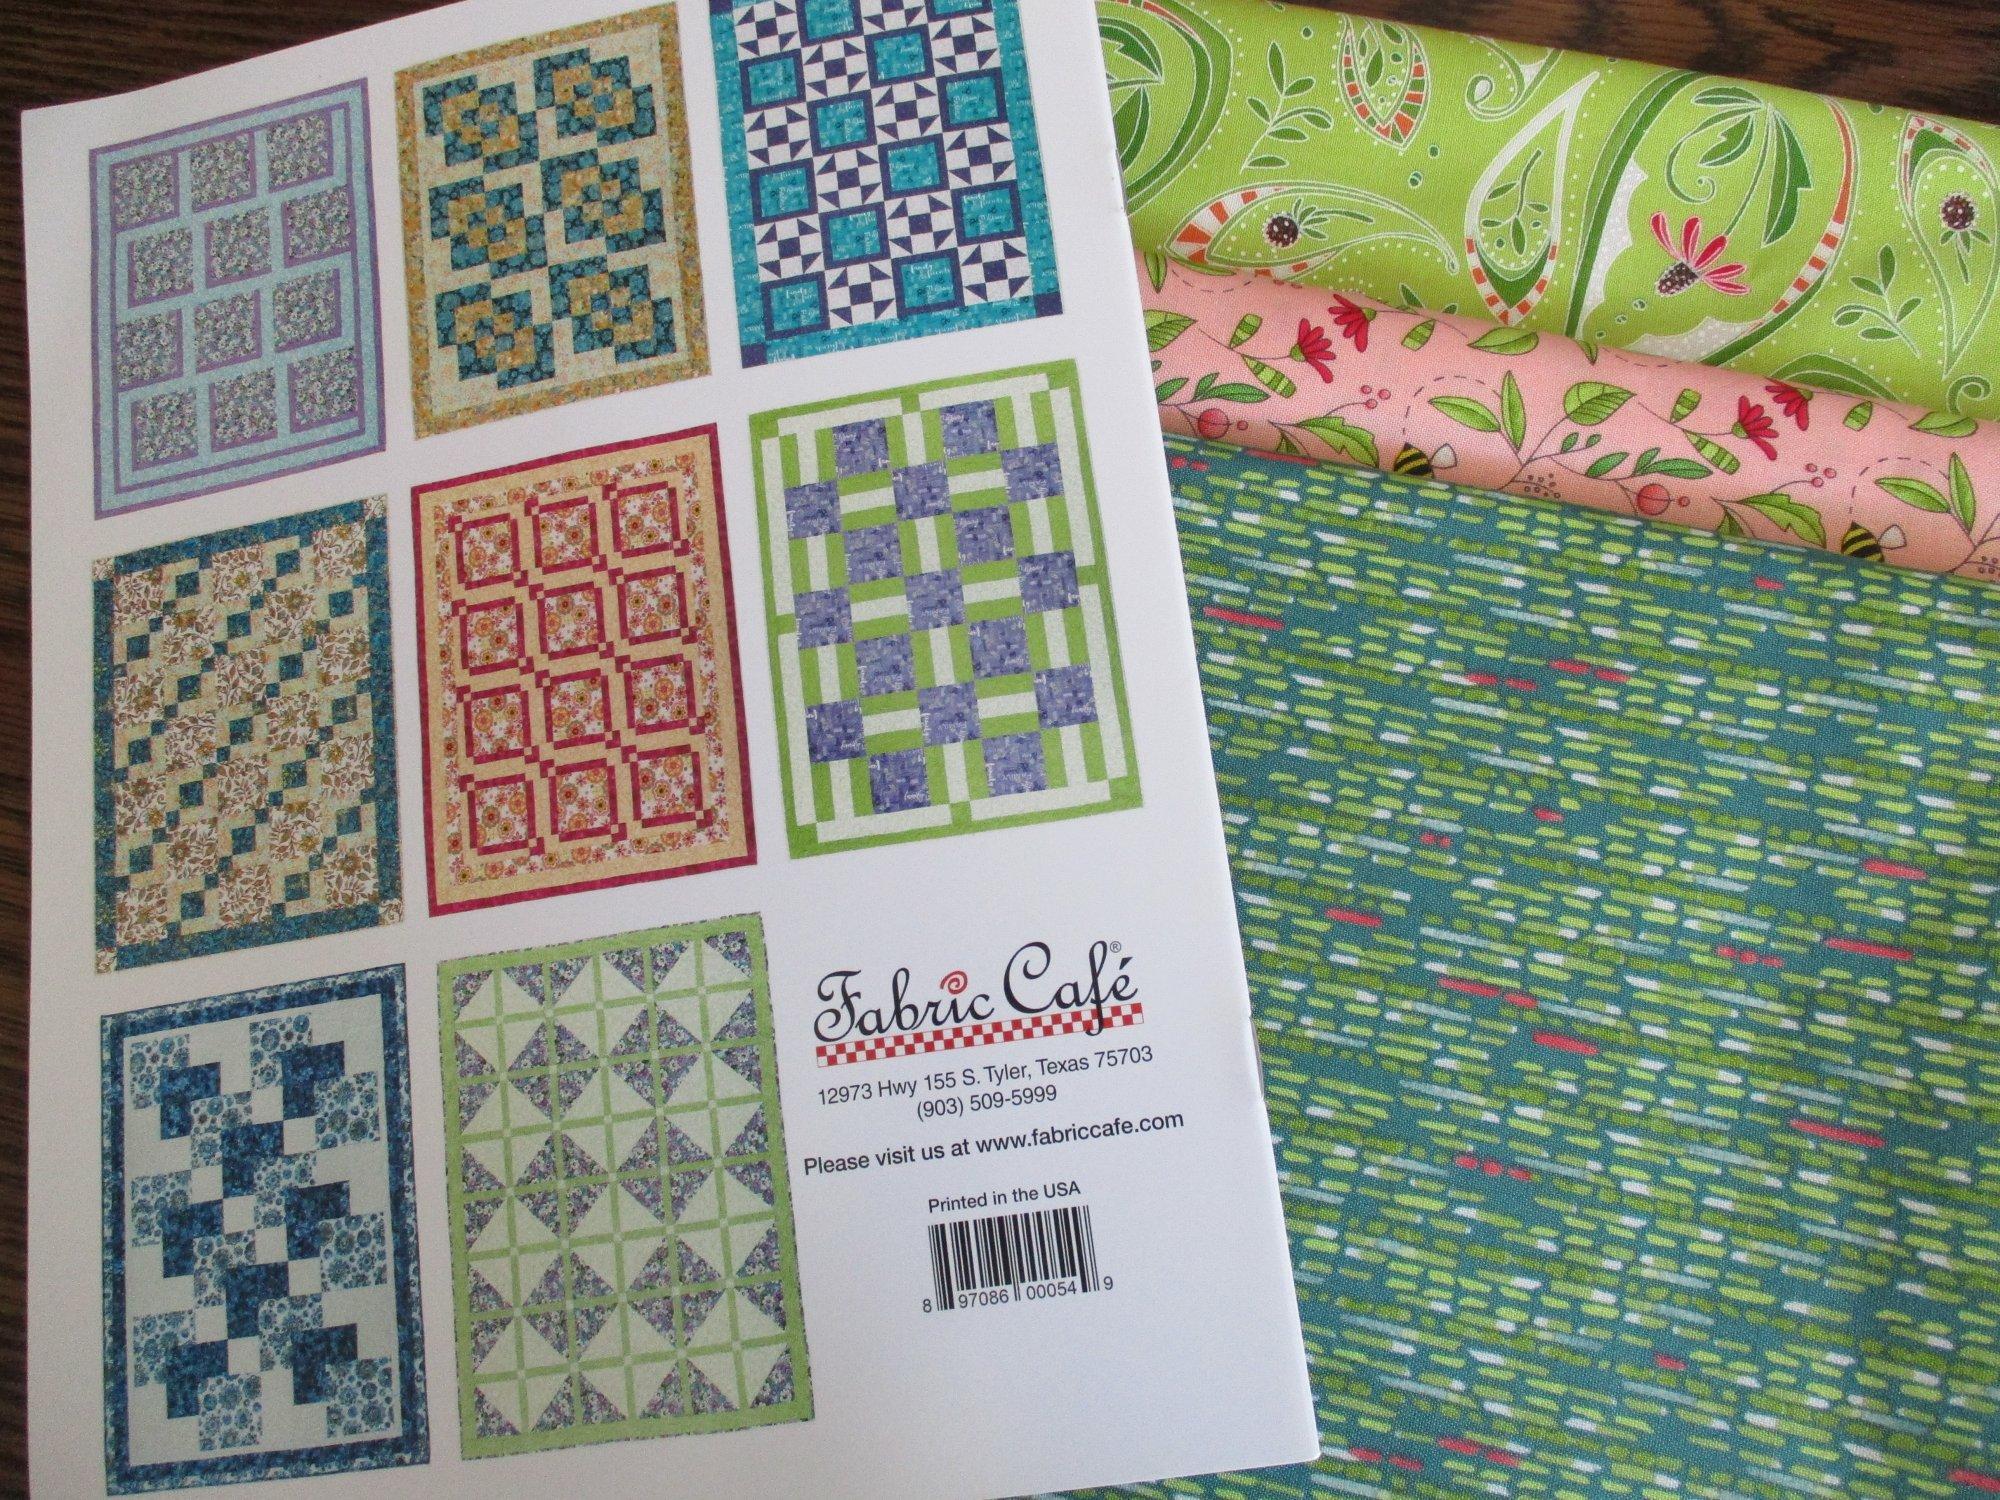 Pretty Darn Quick 3-Yard Quilts quilt kit